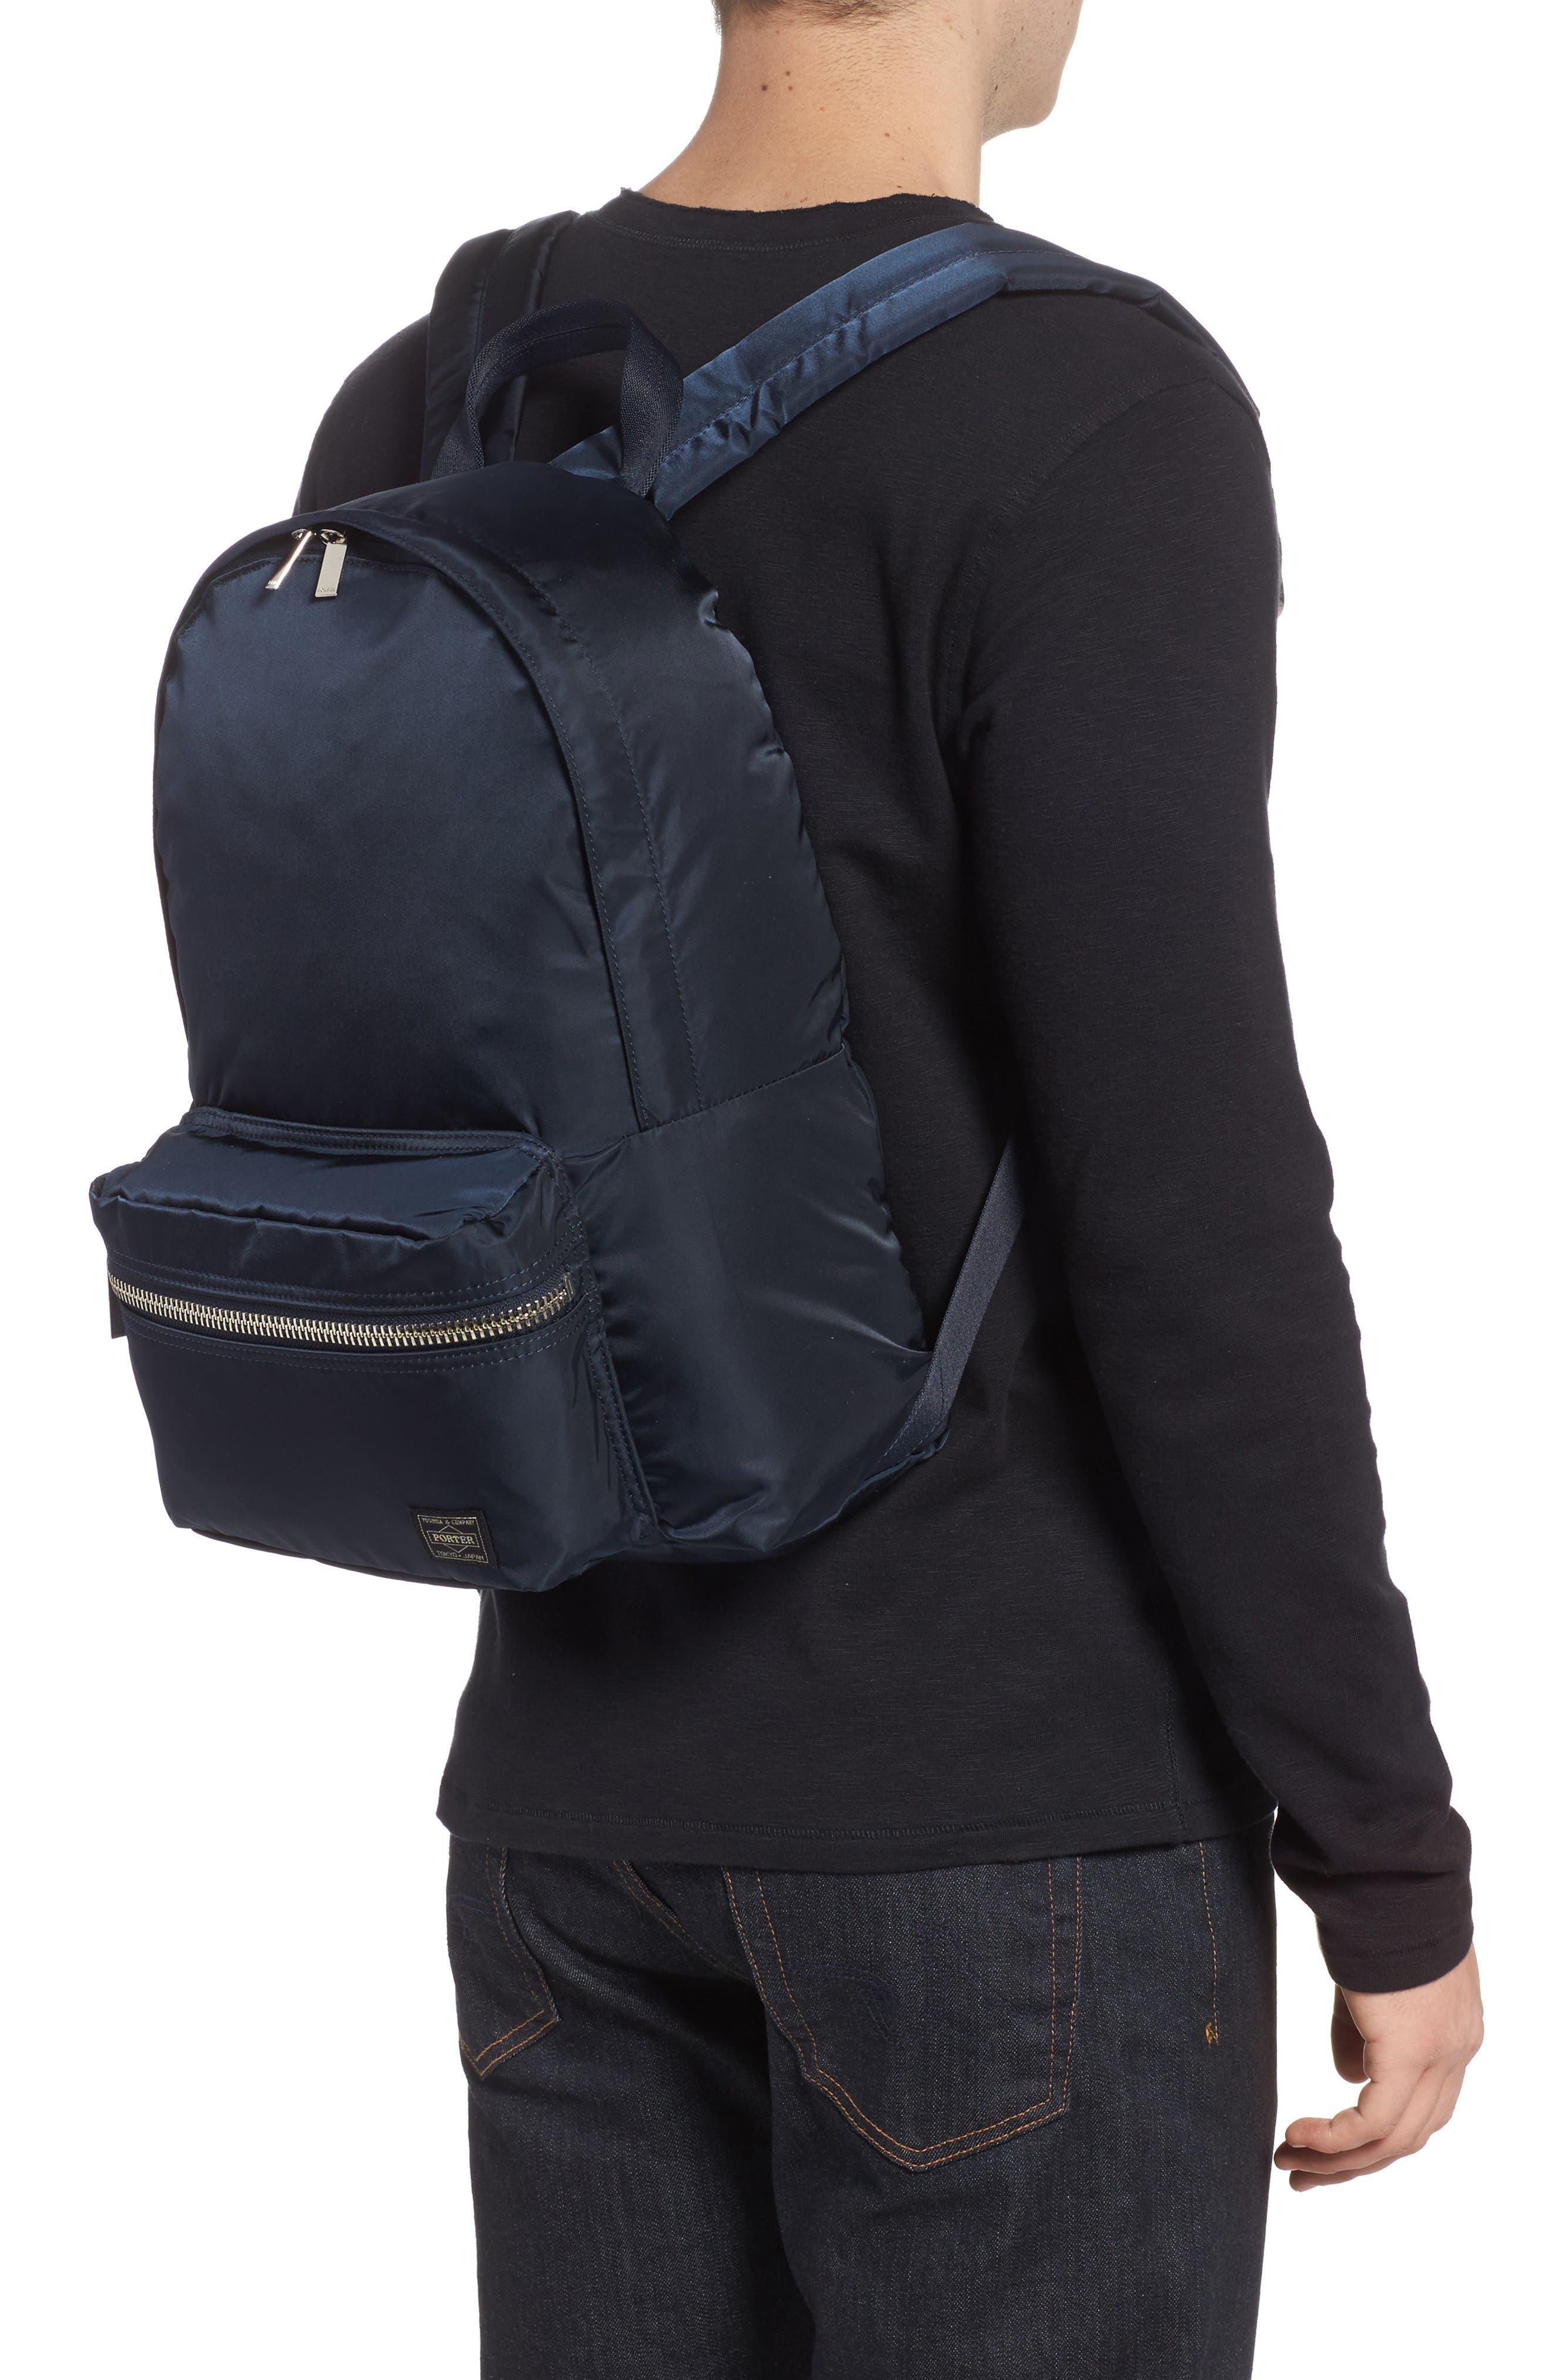 Porter-Yoshida & Co. Daily Backpack,                             Alternate thumbnail 2, color,                             400